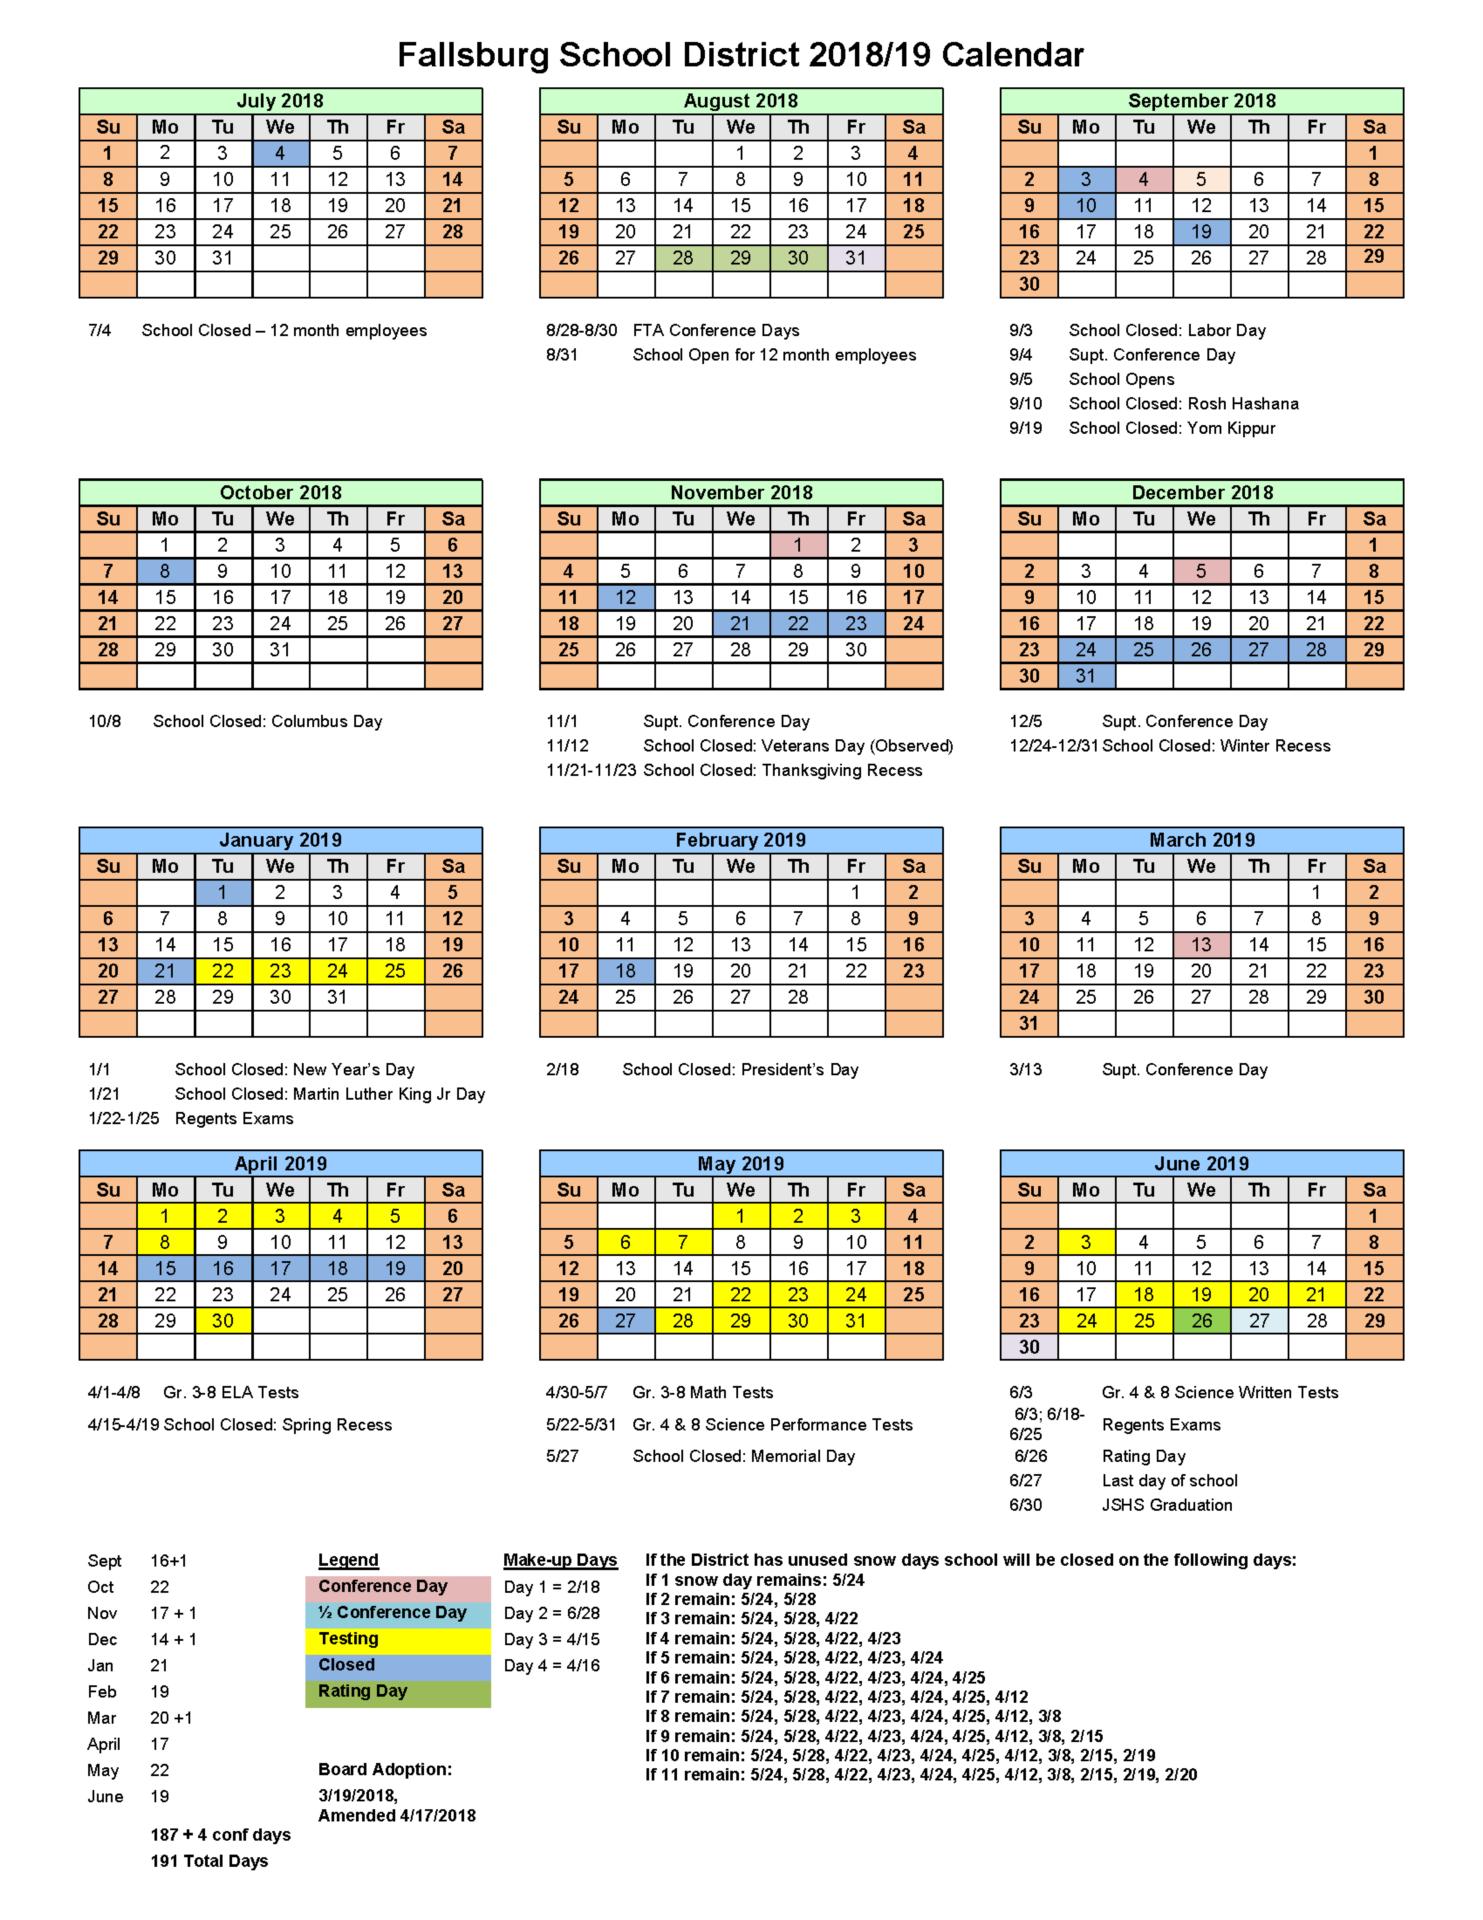 Academic Calendar 18-19